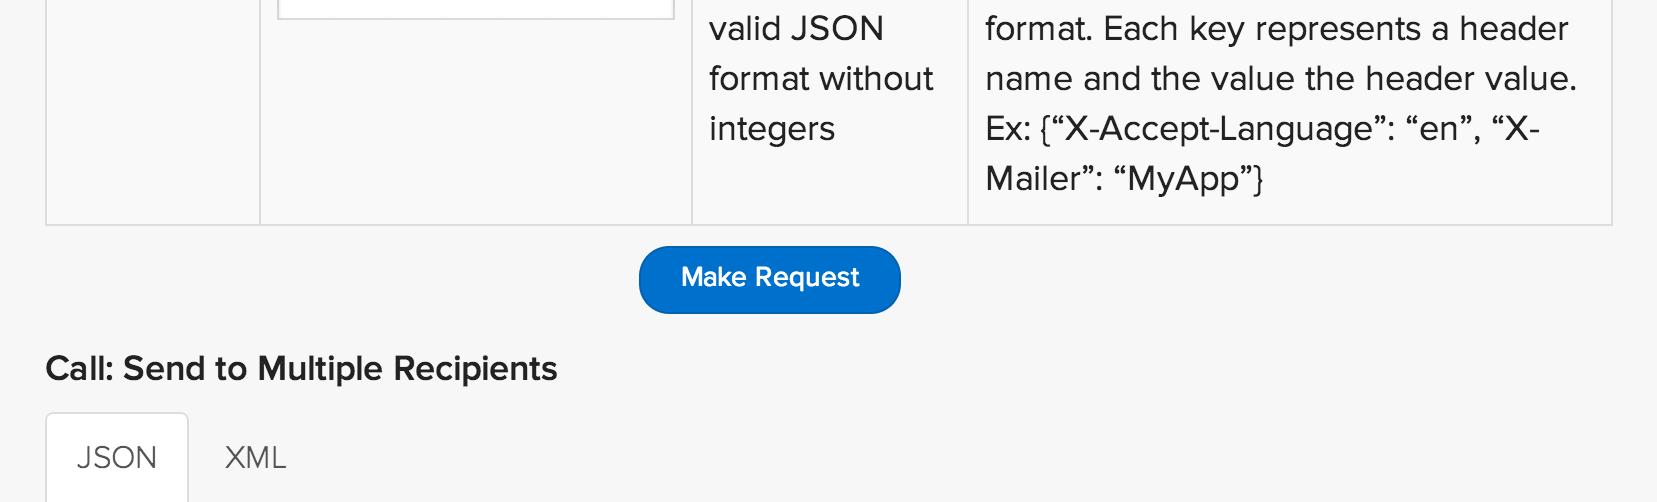 Make Request をクリック